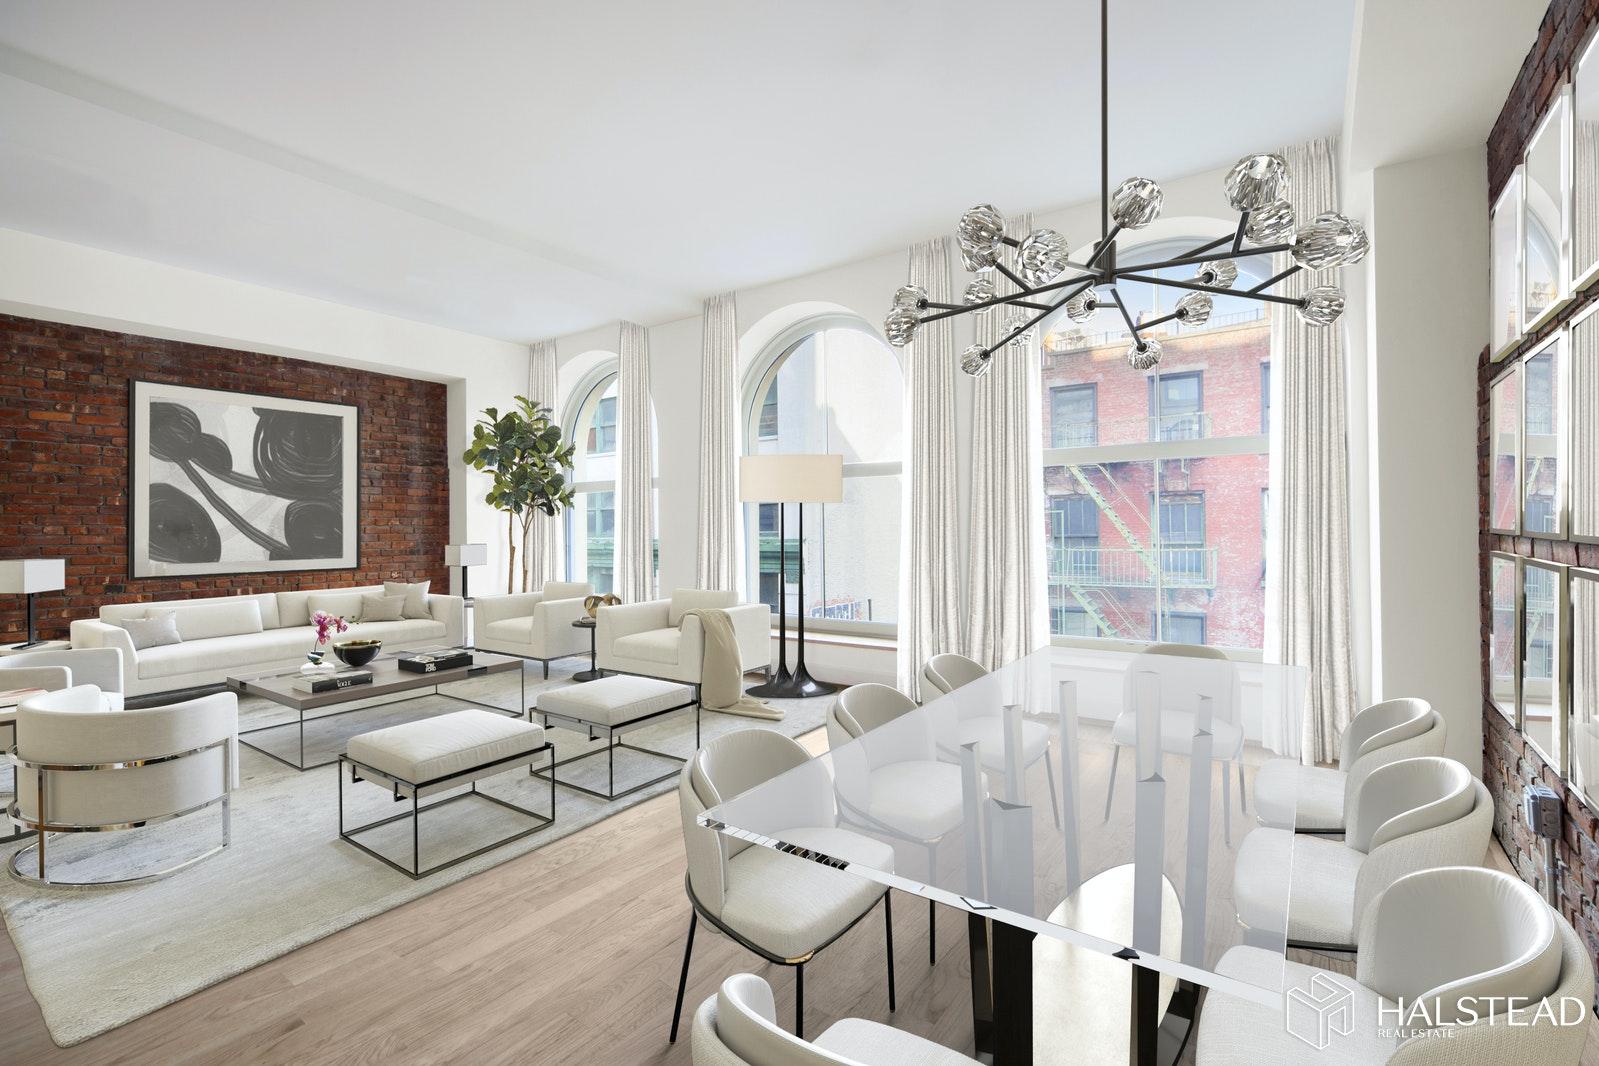 Apartment for sale at 83 Walker Street, Apt 6